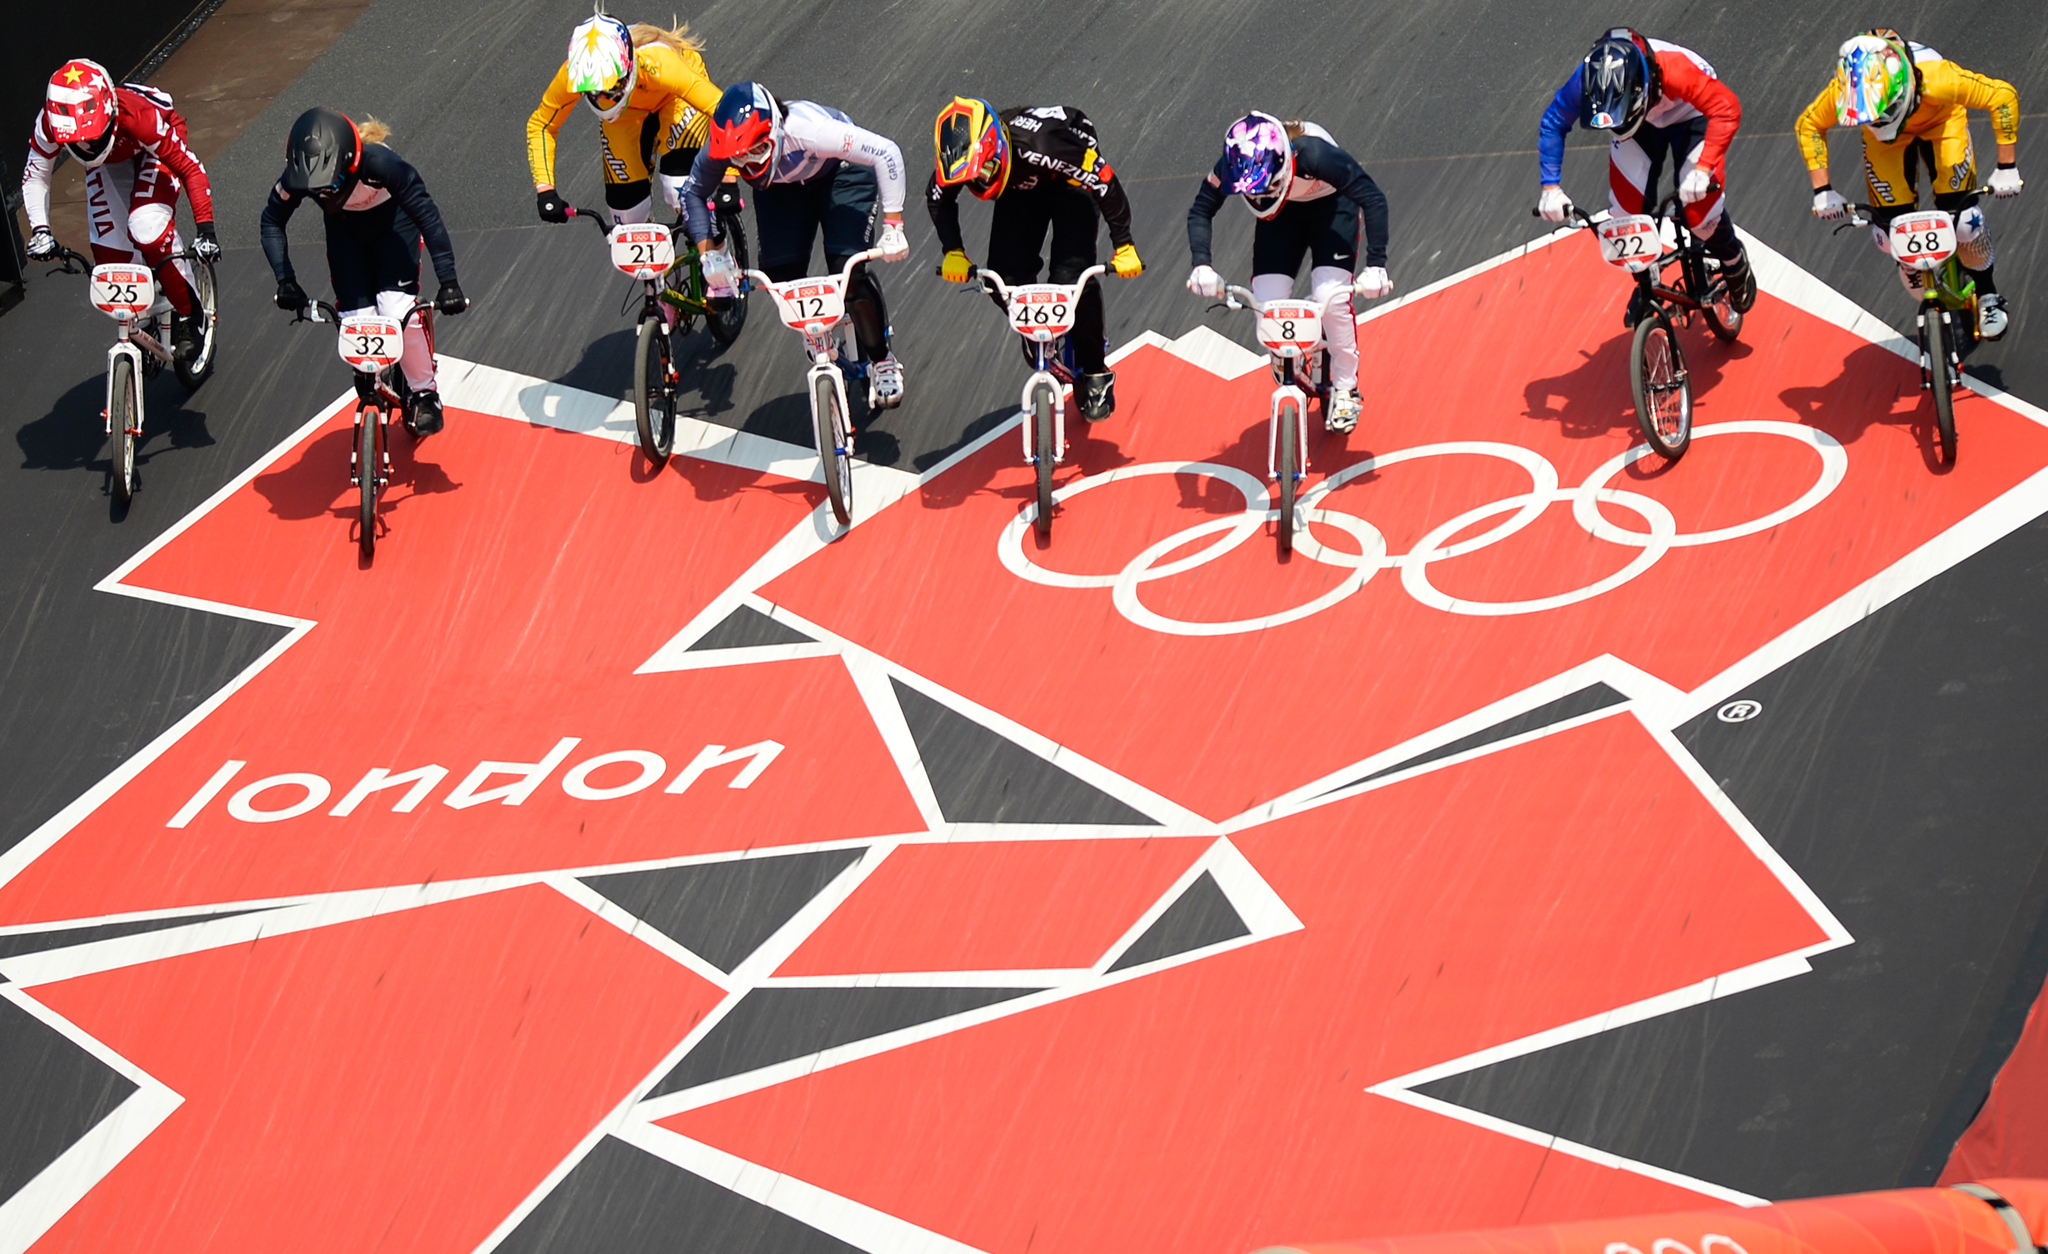 /photo/2012/0810/as_bmx_olympic2_2048.jpg